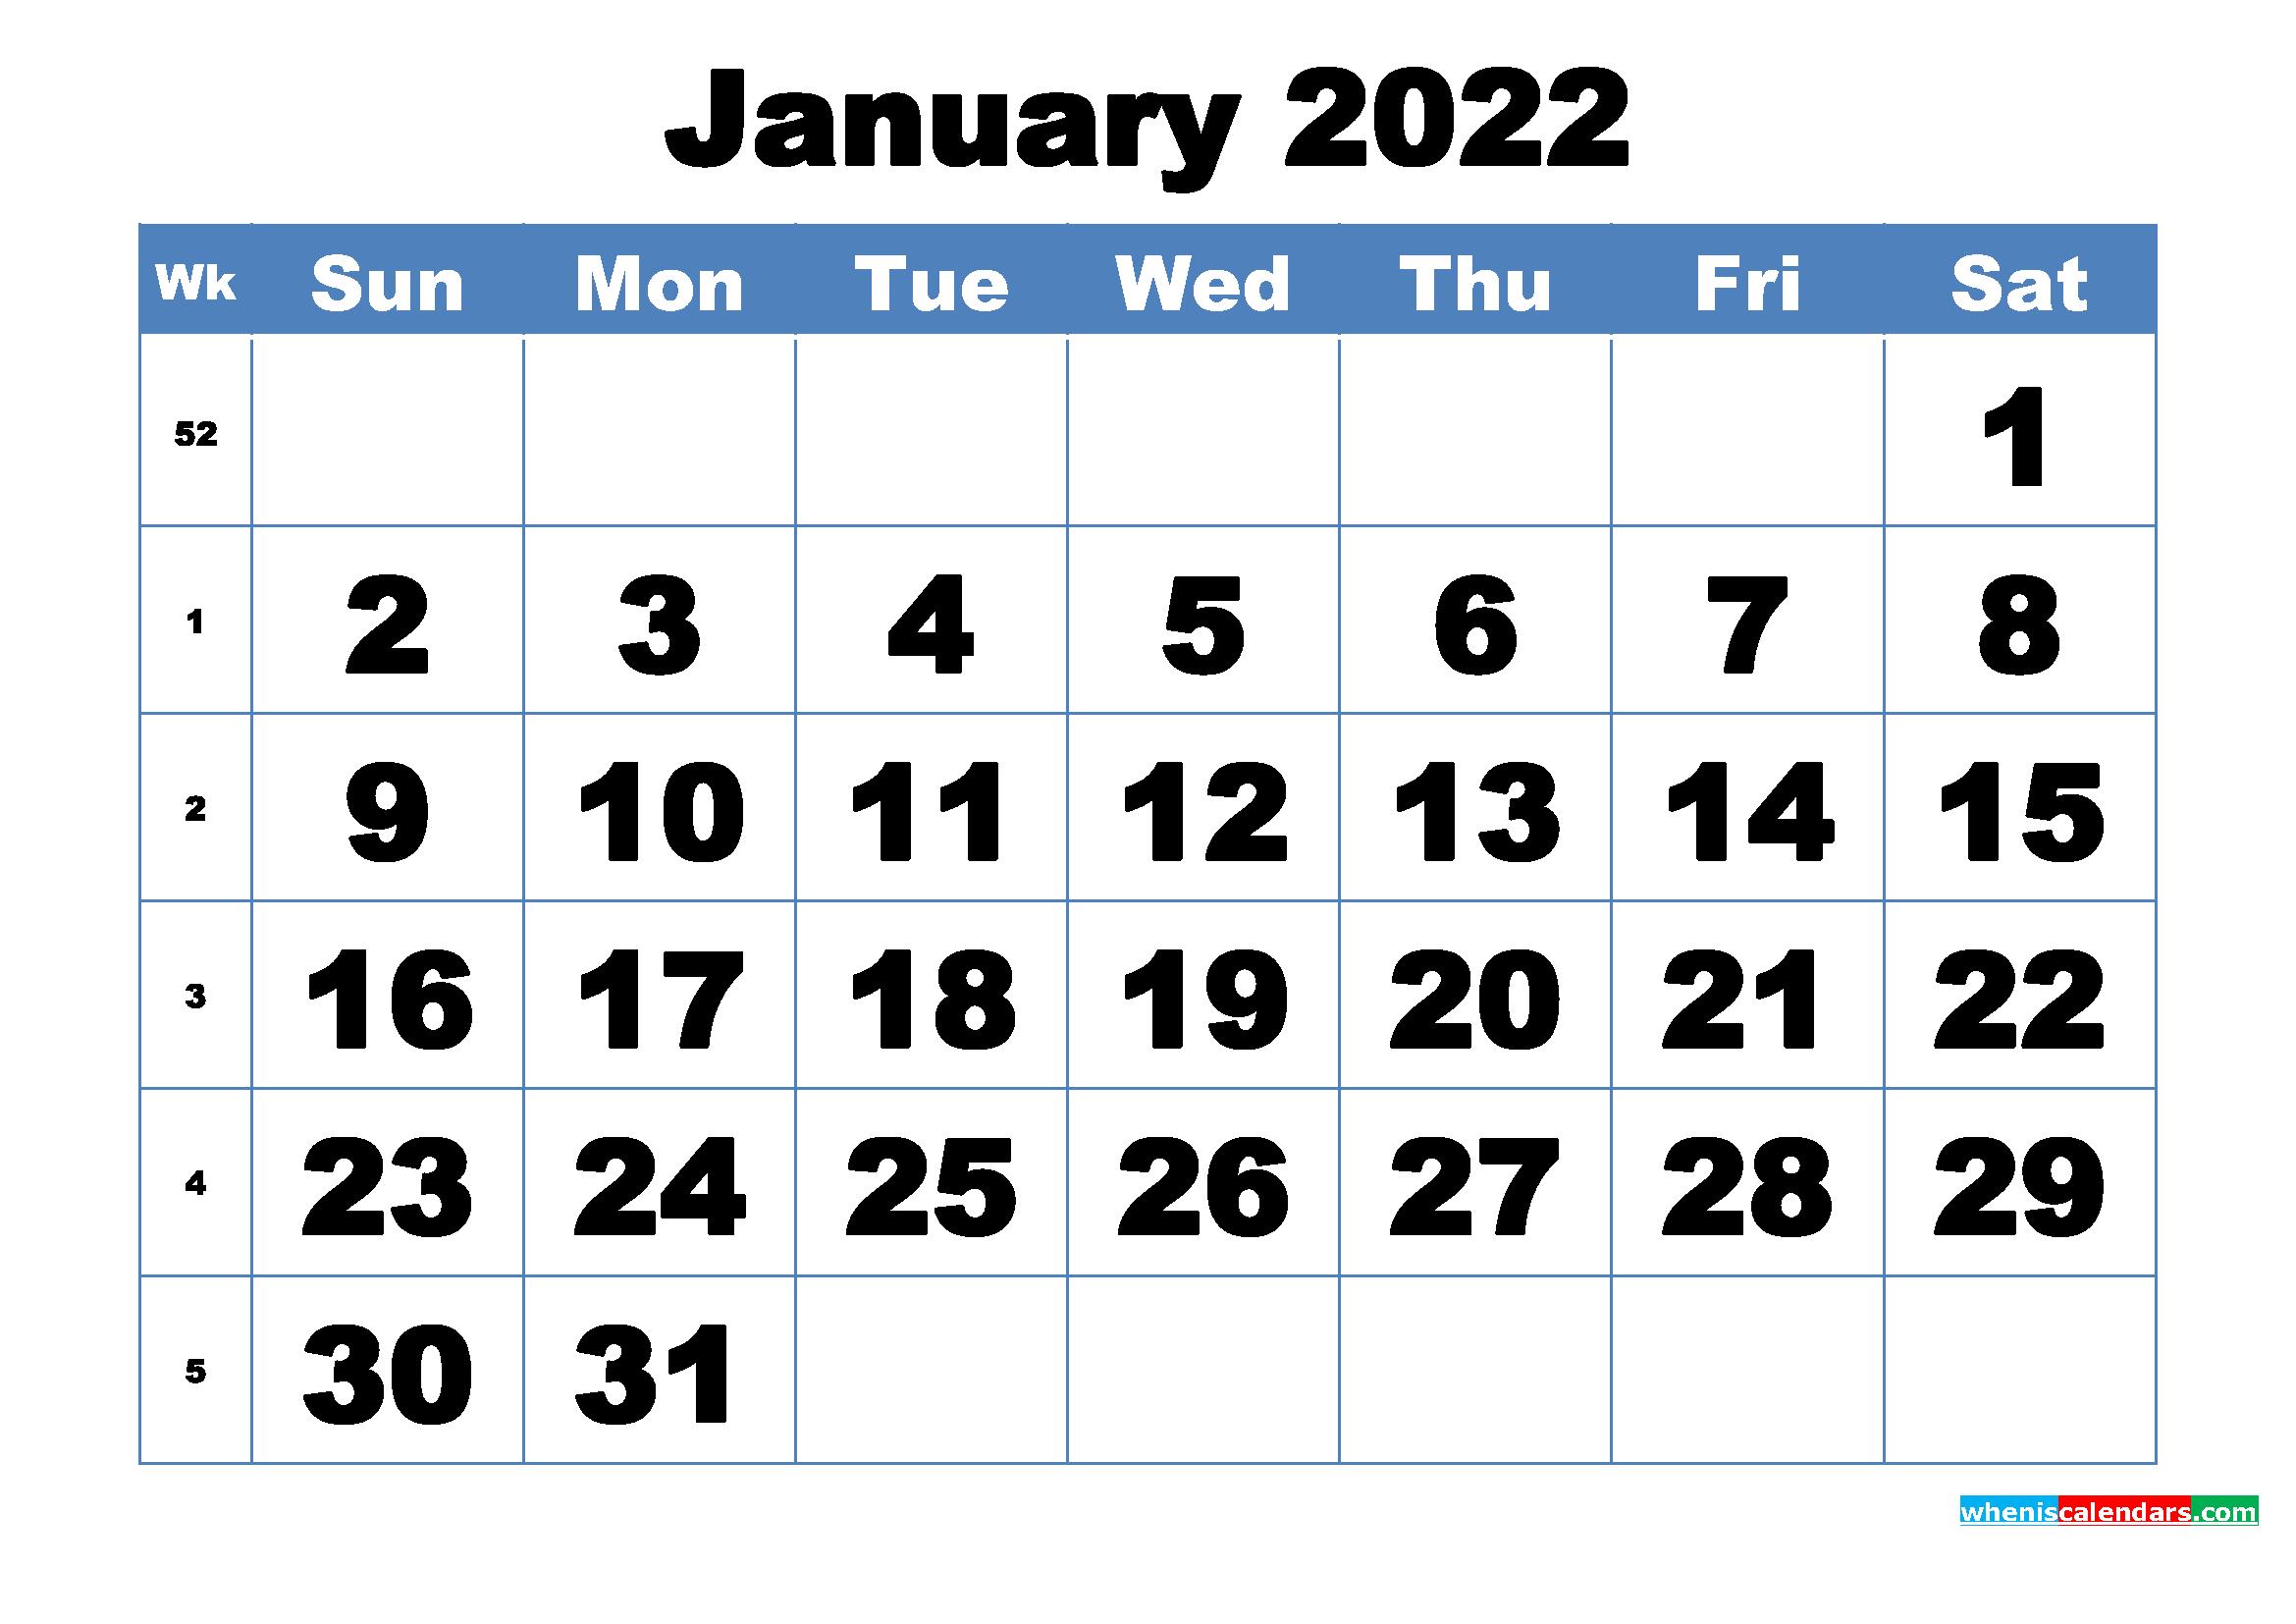 Free Printable January 2022 Calendar Template Word, Pdf With Regard To 2022 January Blank Calendar